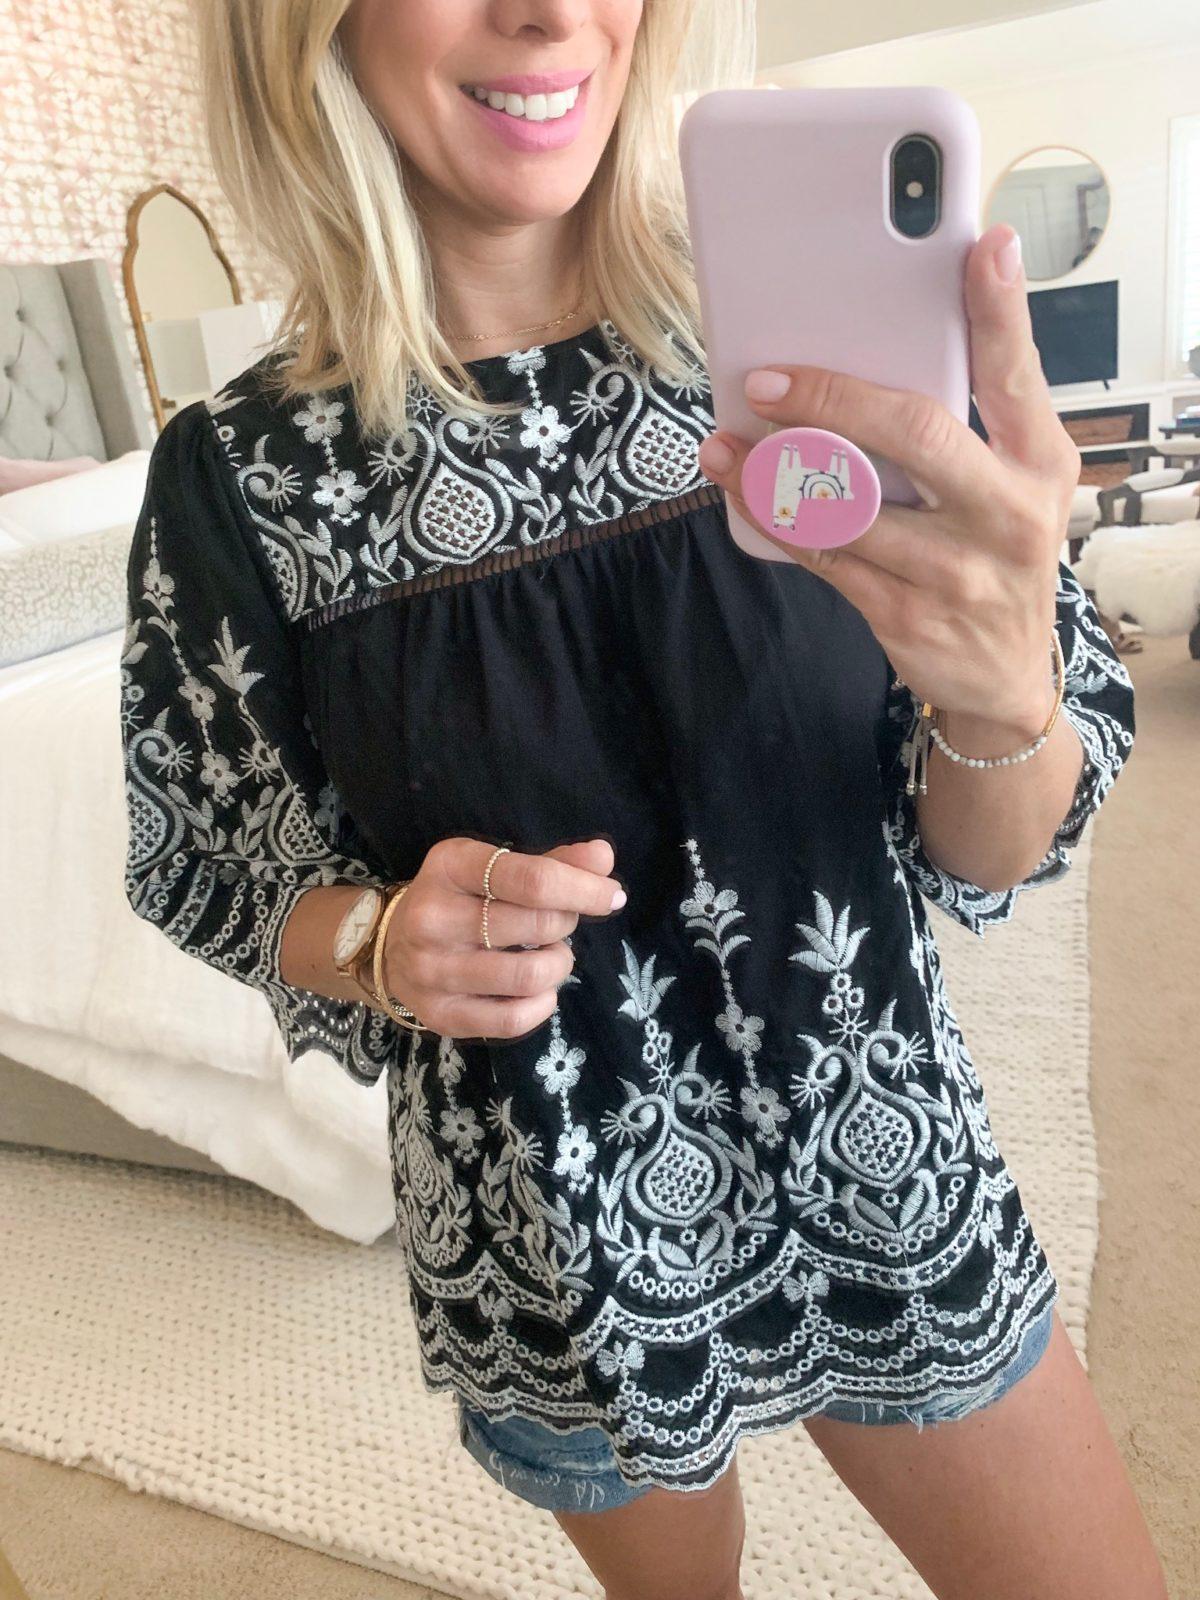 Amazon Fashion haul - black embroidered top